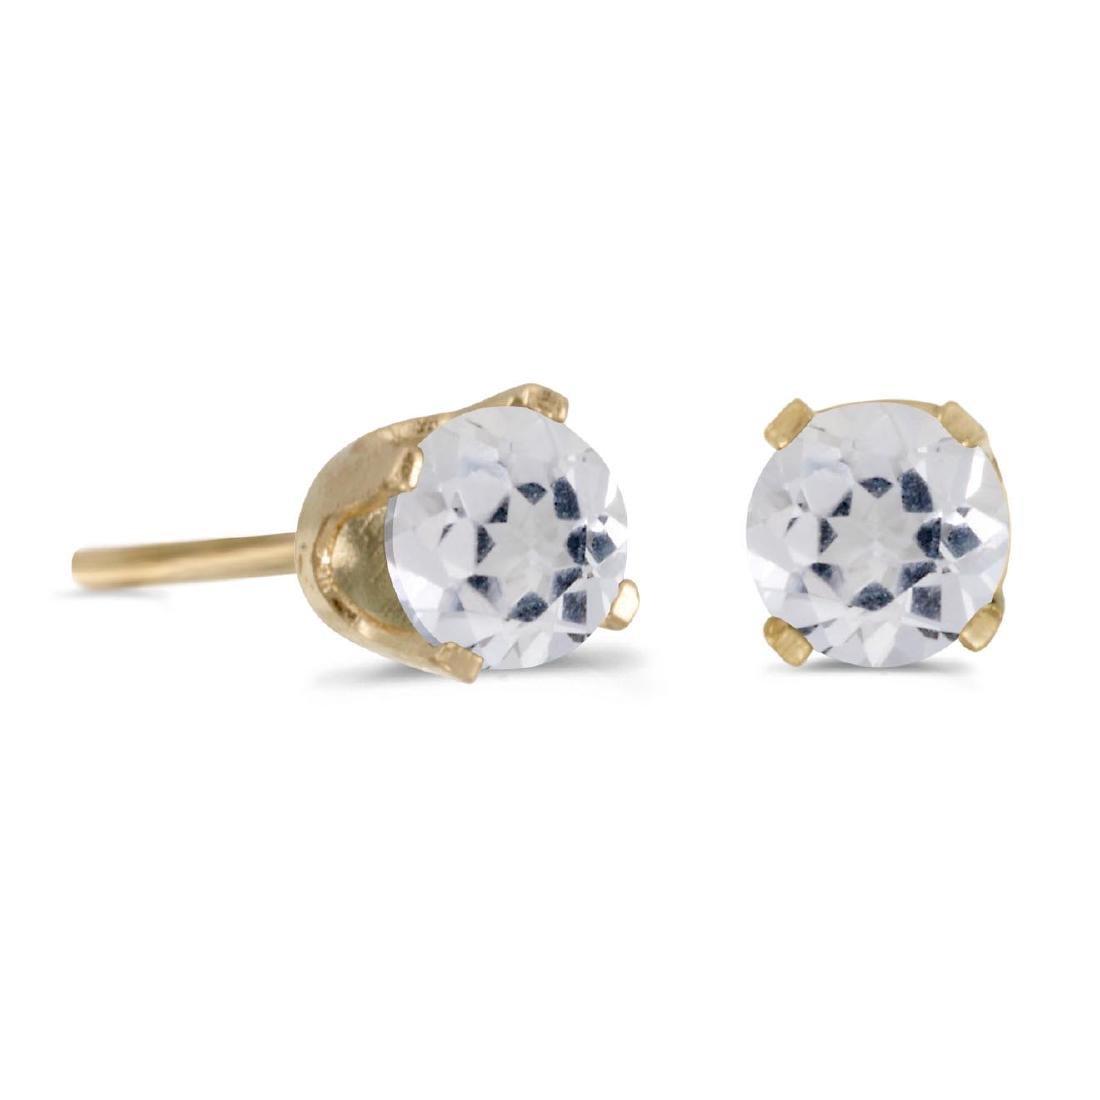 Certified 4 mm Round White Topaz Stud Earrings in 14k Y